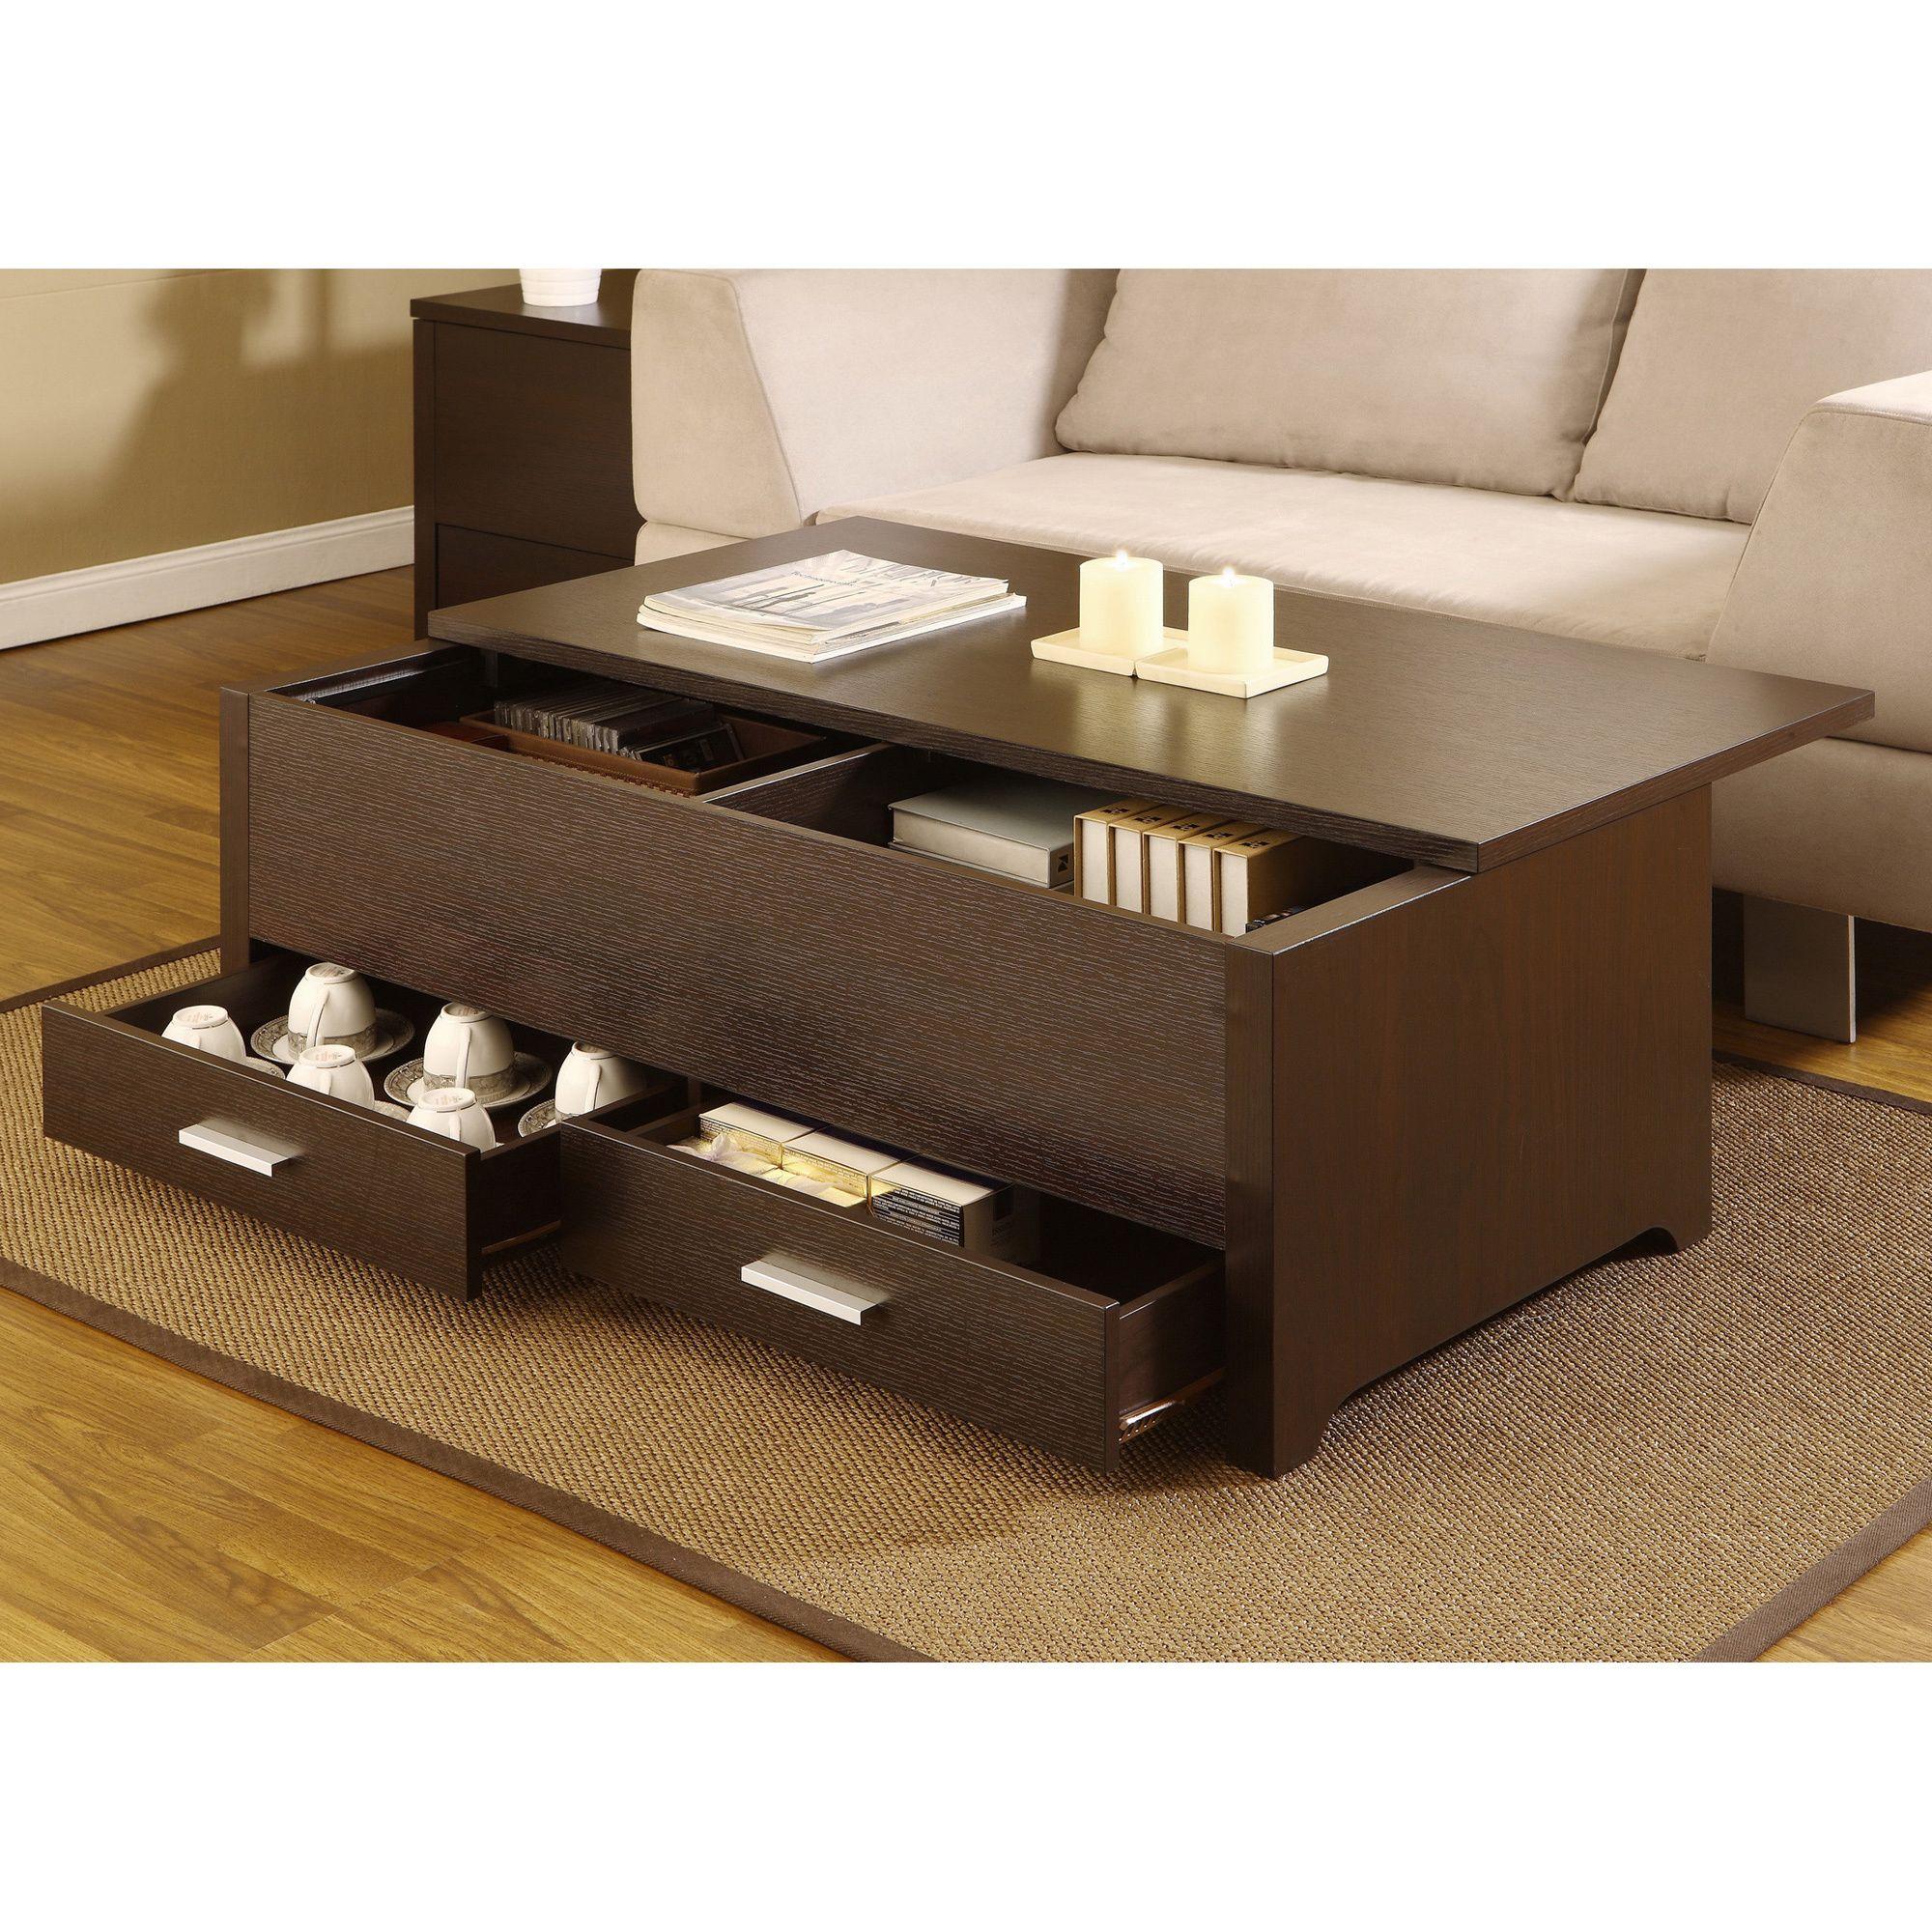 Gentil U003cliu003eMaterials: Wood, Veneer, MDFu003c/liu003e U003cliu003eFinish: Dark Espressou003c/liu003e  U003cliu003eTwo (2) Deep Drawers And A Sliding Table Top Panel Provide Plenty Of  Storage ...